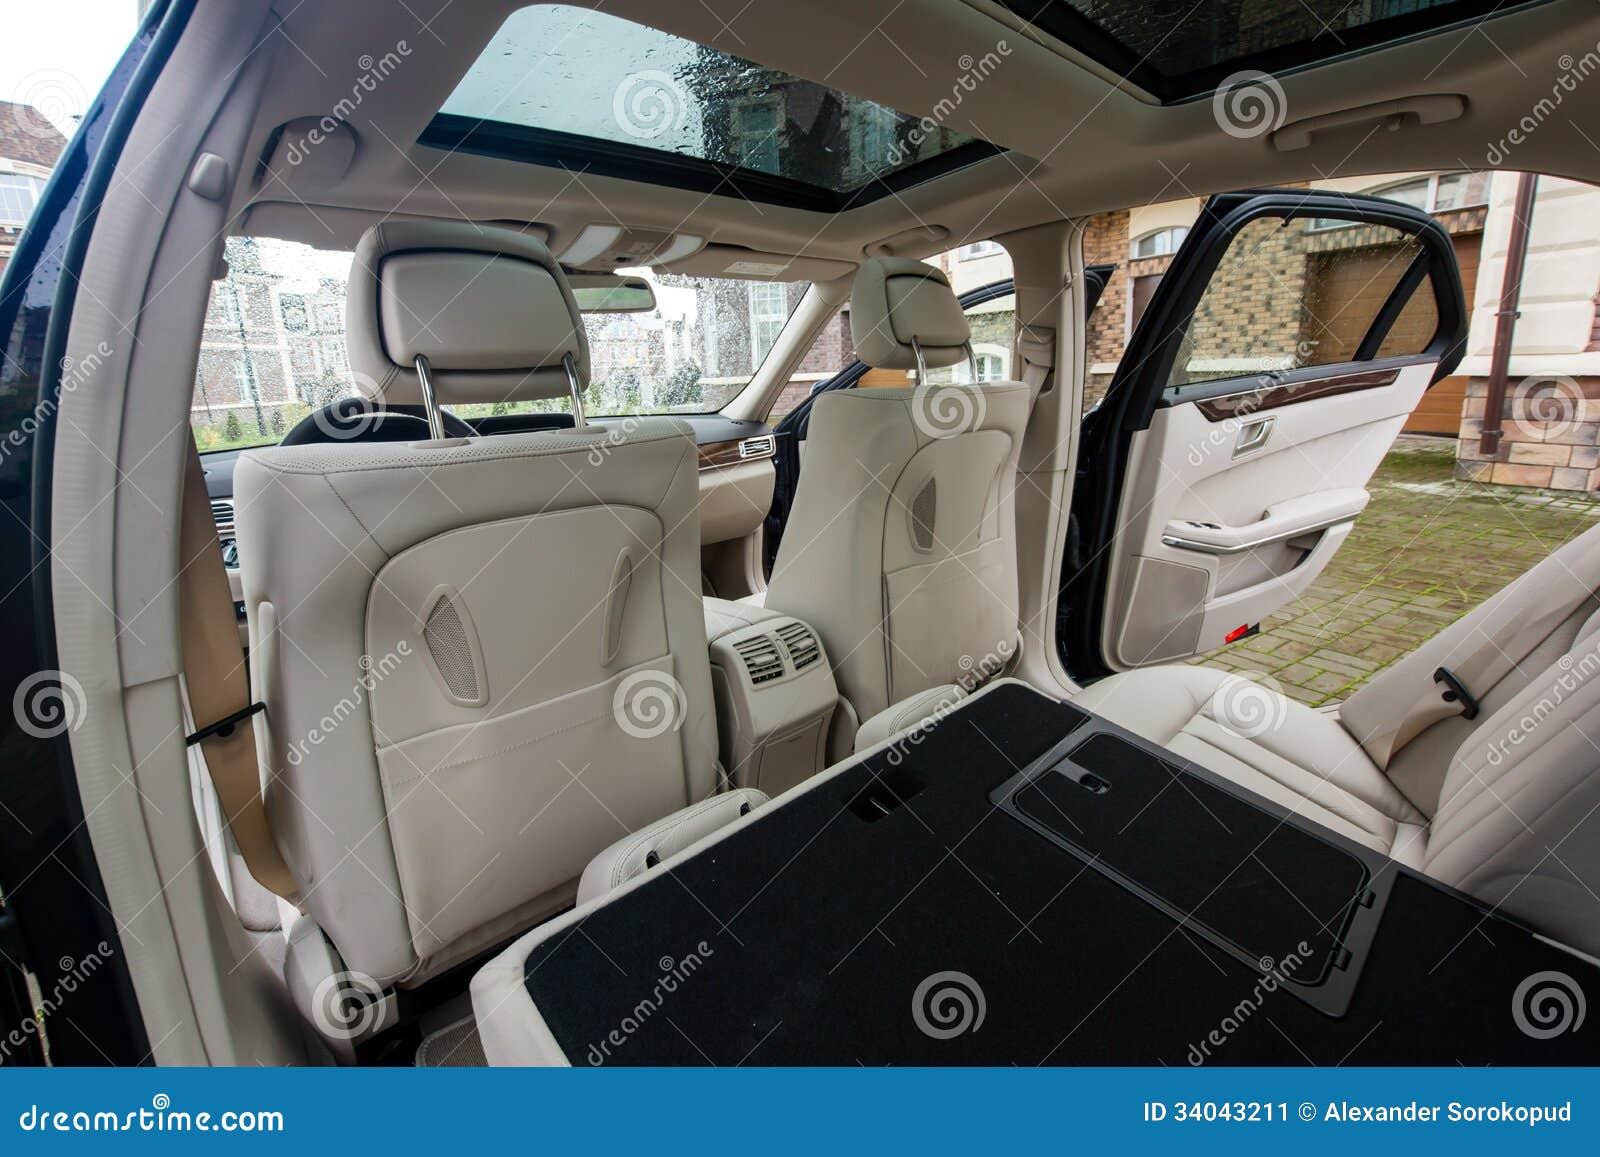 luxury car interior stock image image 34043211. Black Bedroom Furniture Sets. Home Design Ideas